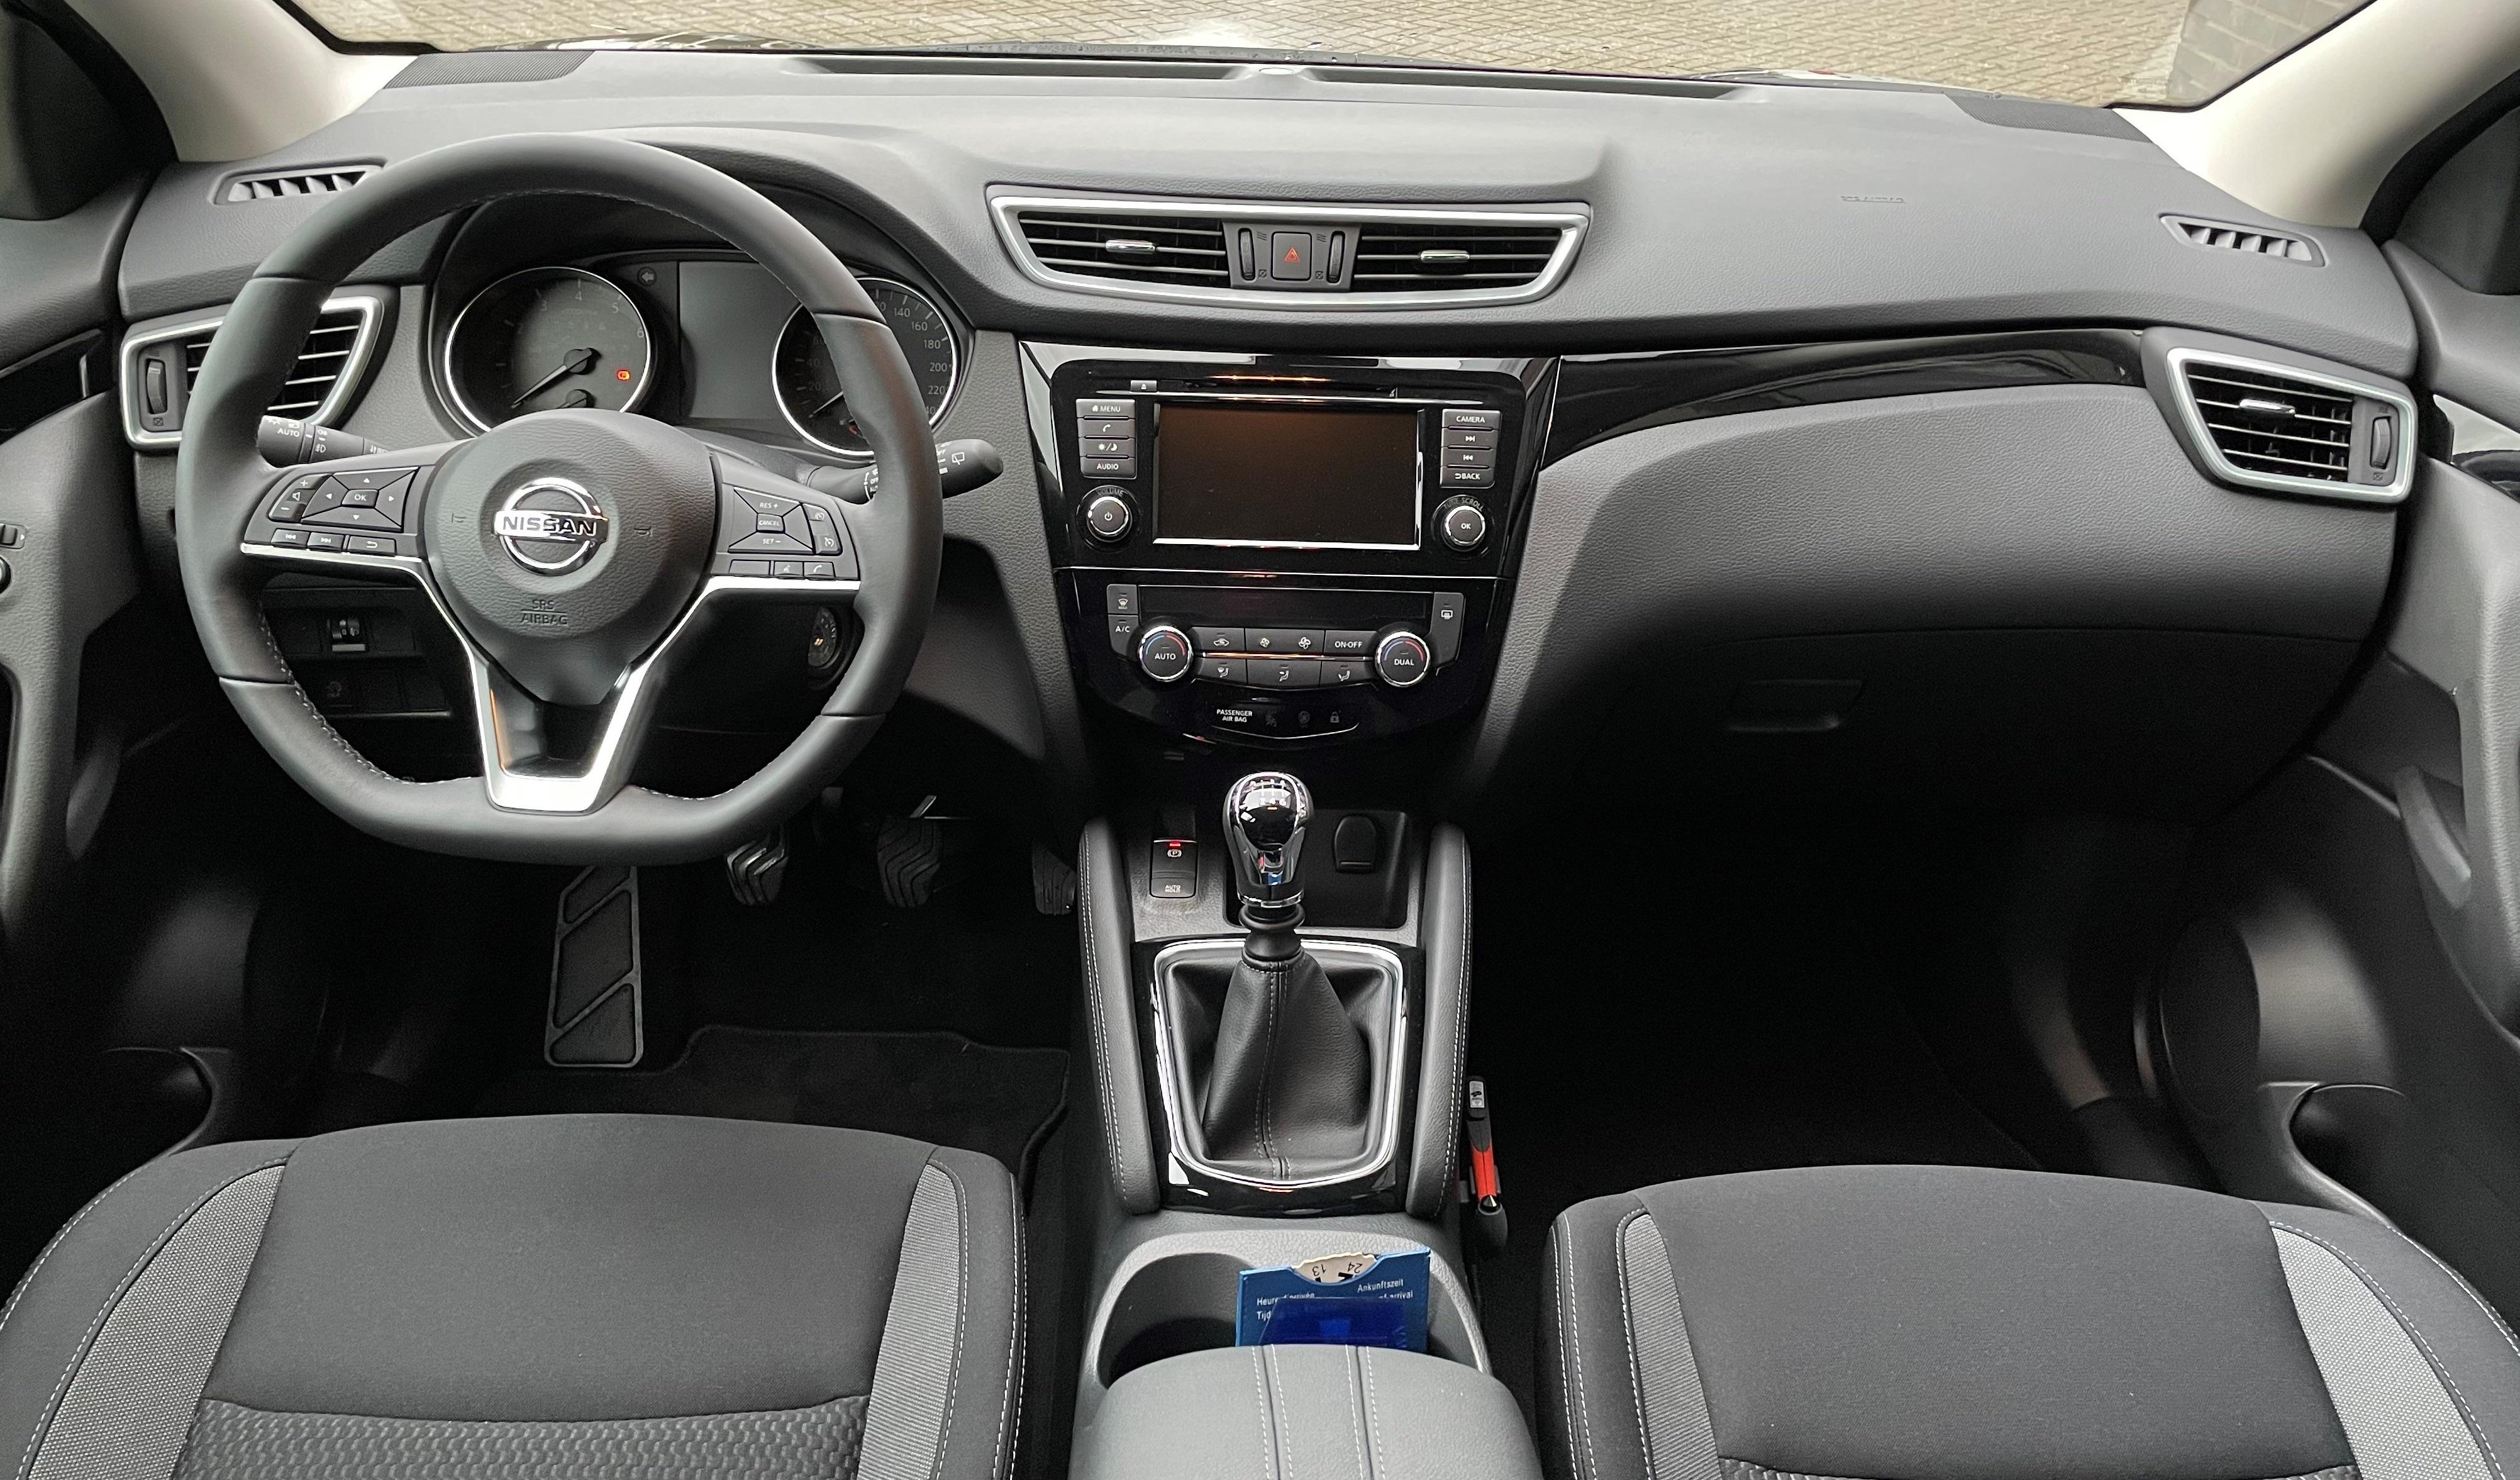 Nissan Qashqai binnenzijde